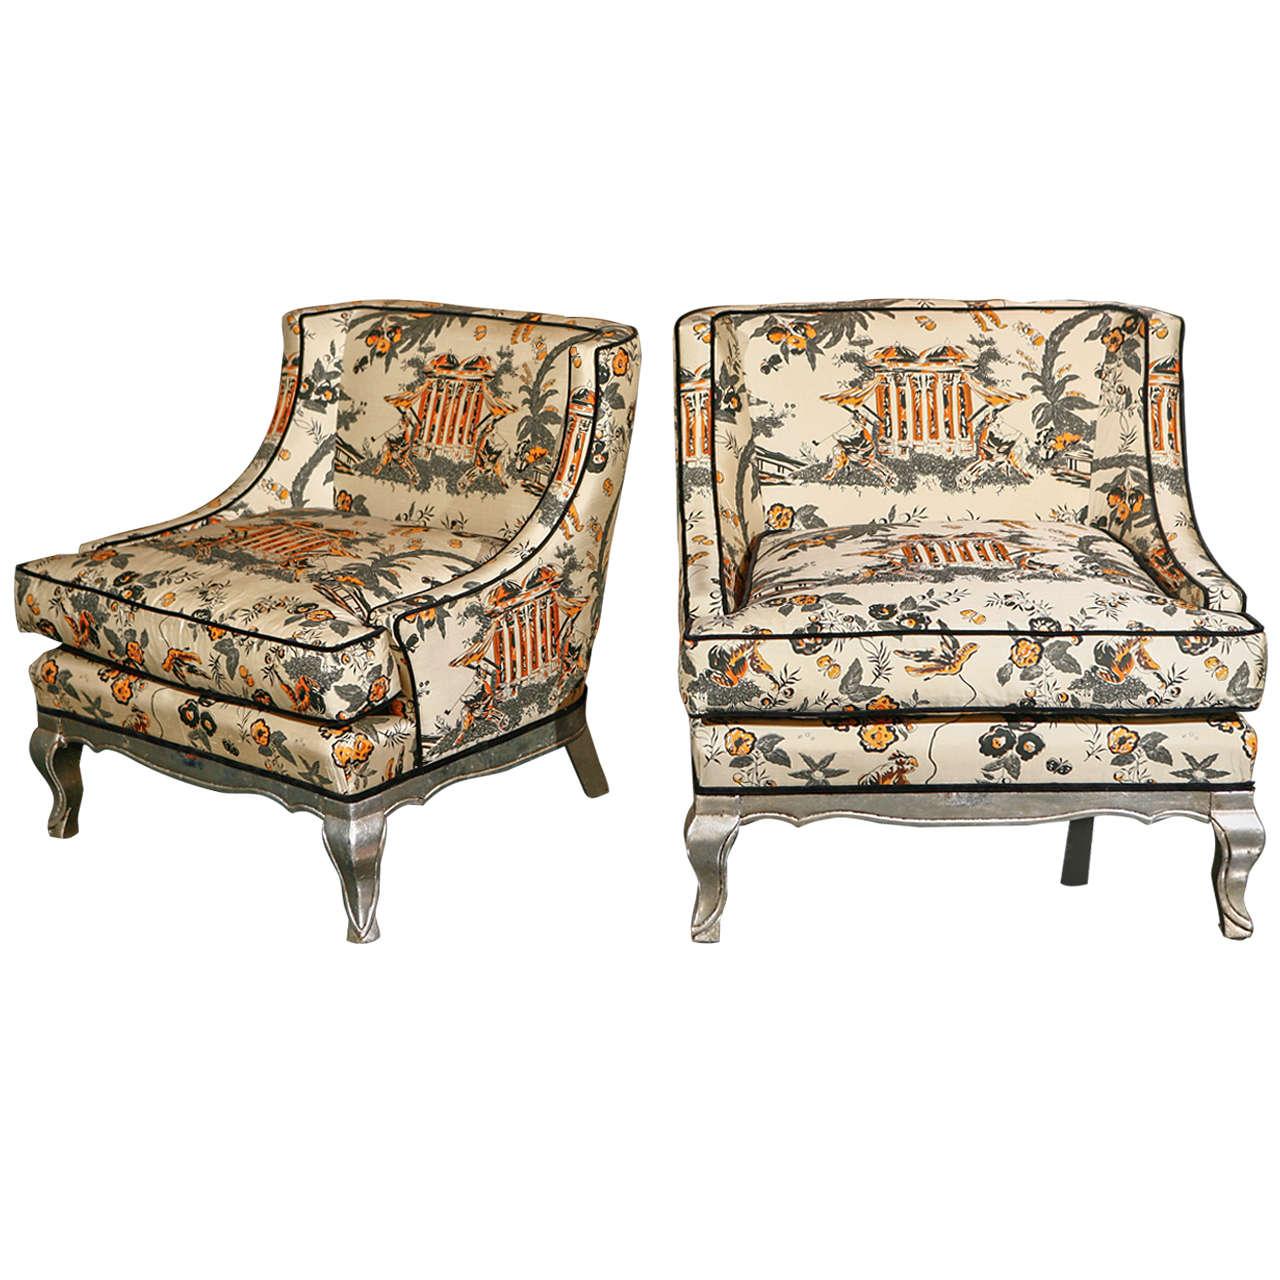 Pair Of Art Deco Silk Chinoiserie Chairs 1